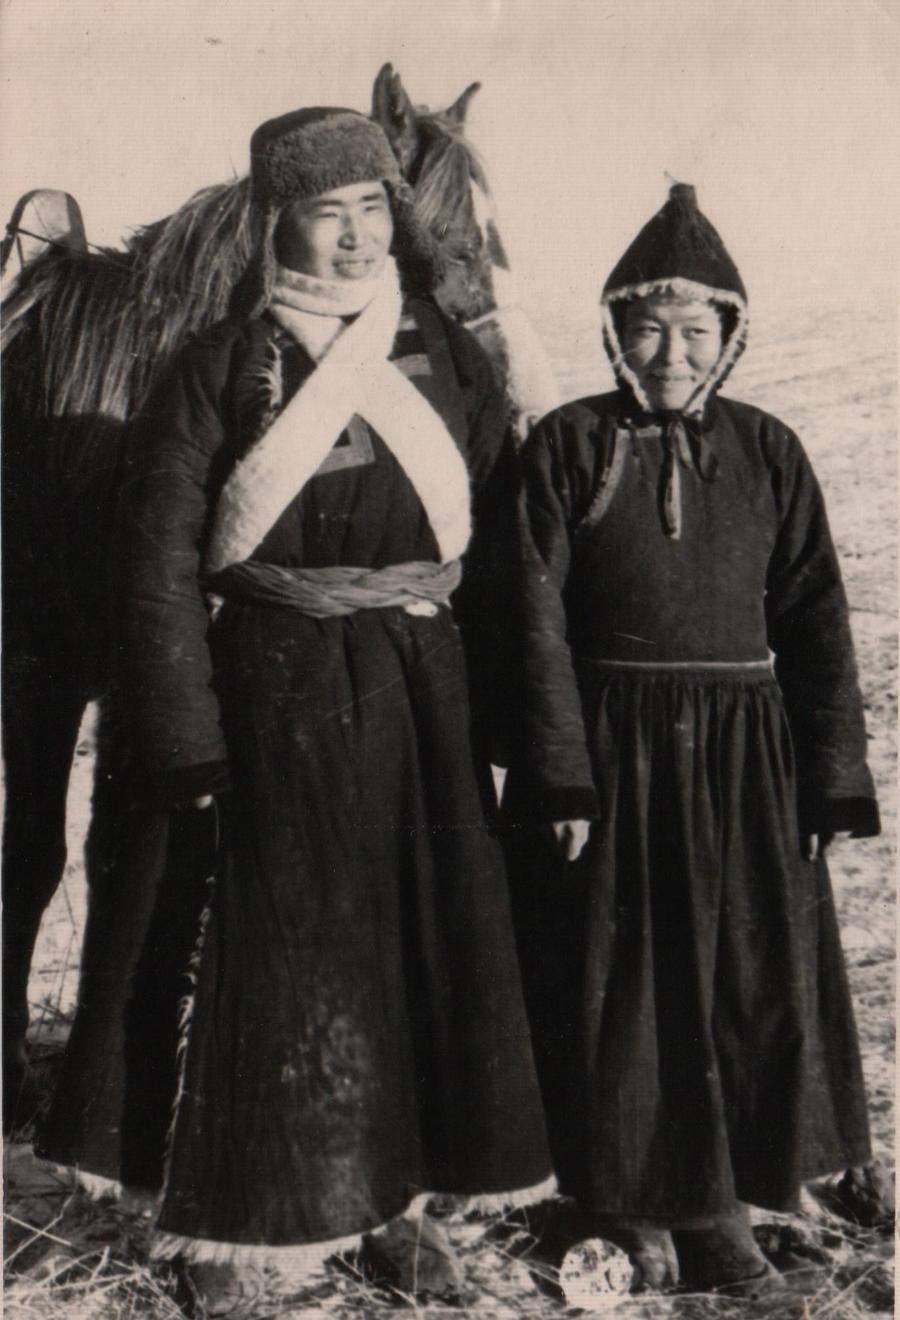 Супруги Юундэн-Доржо Бальжиев и его жена. 1955 г. Хунхэр.jpg